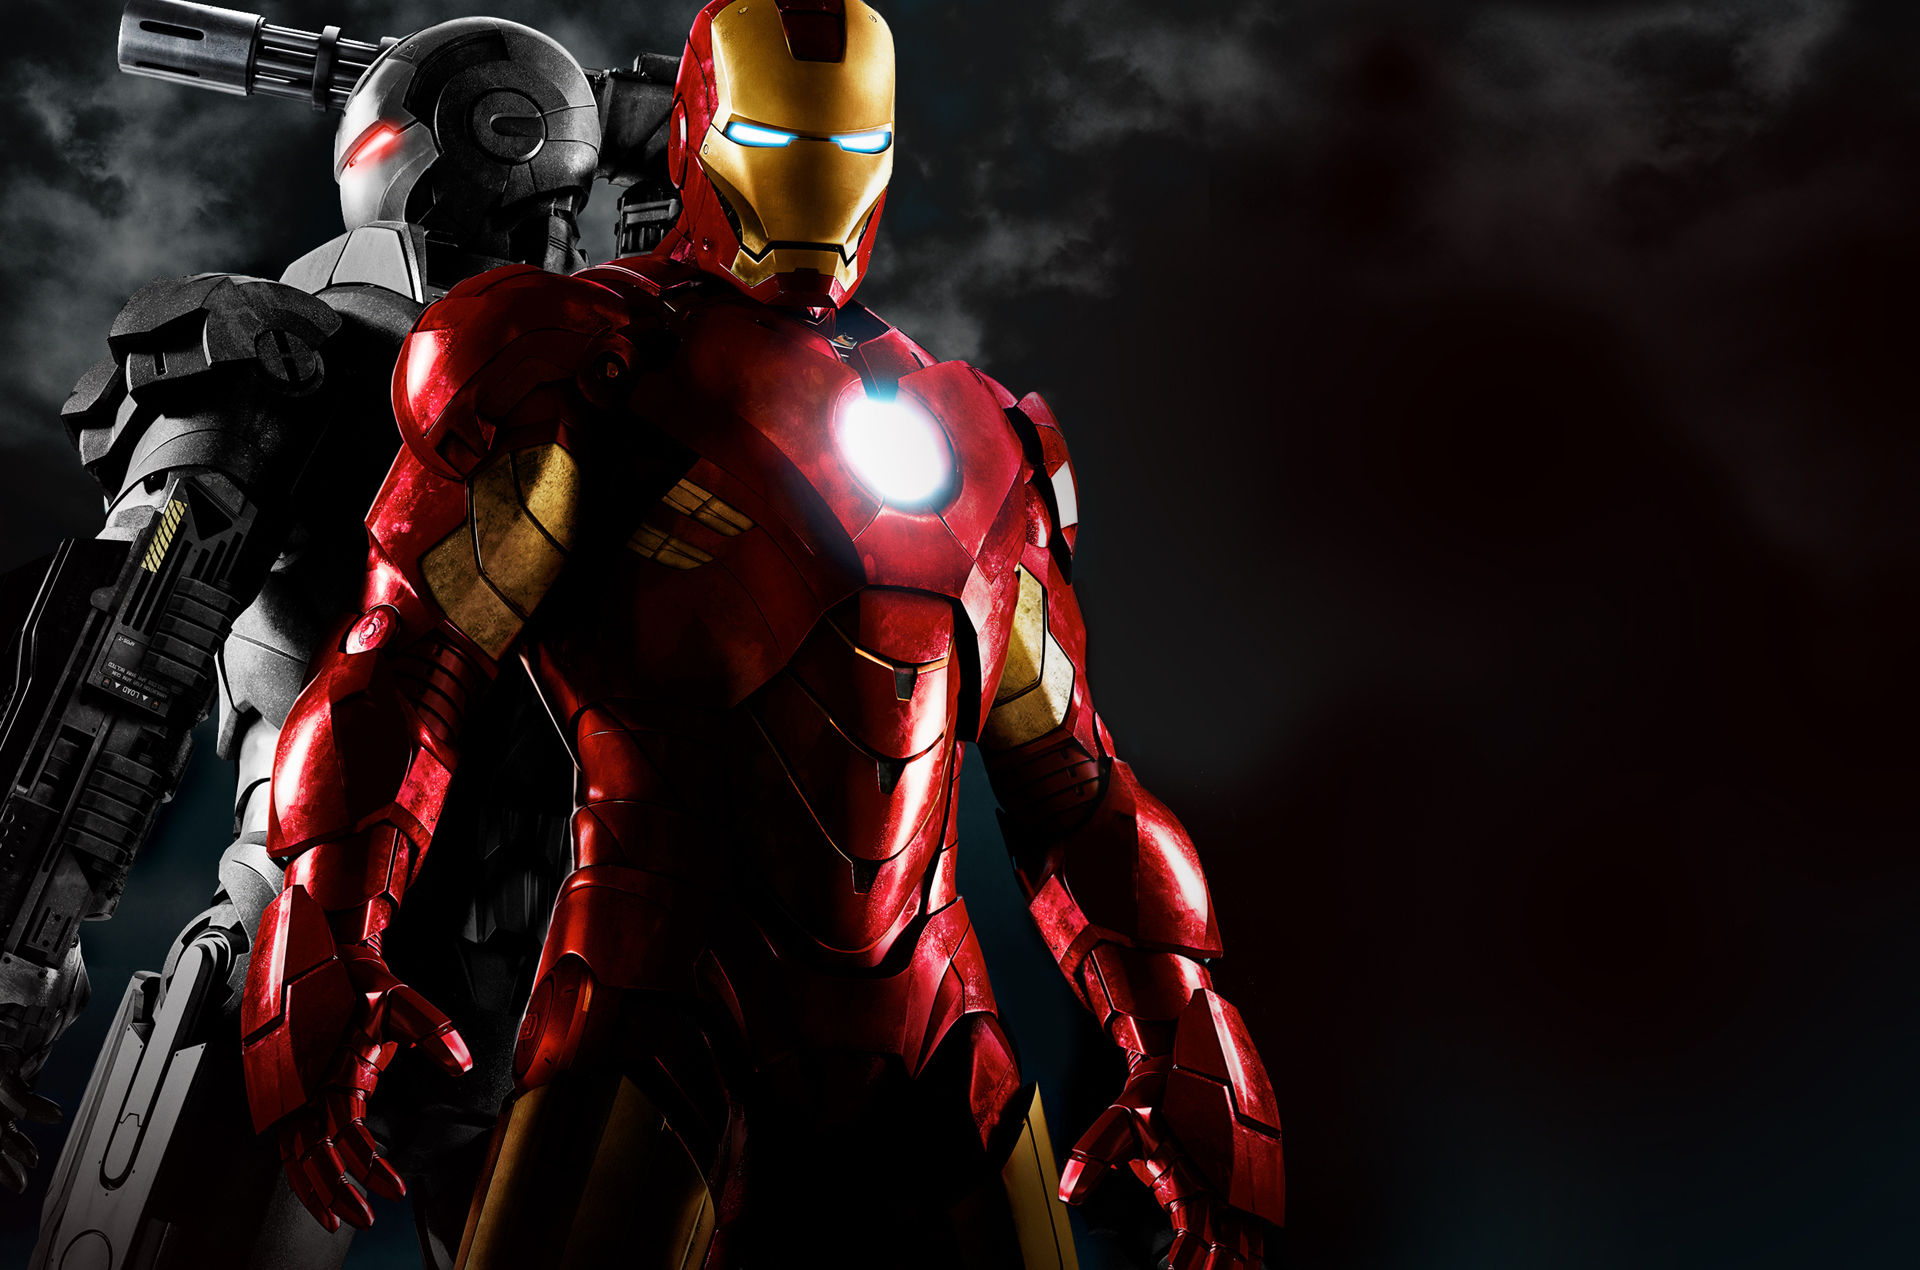 Fonds d'écran Iron Man 2 - MaximumWall